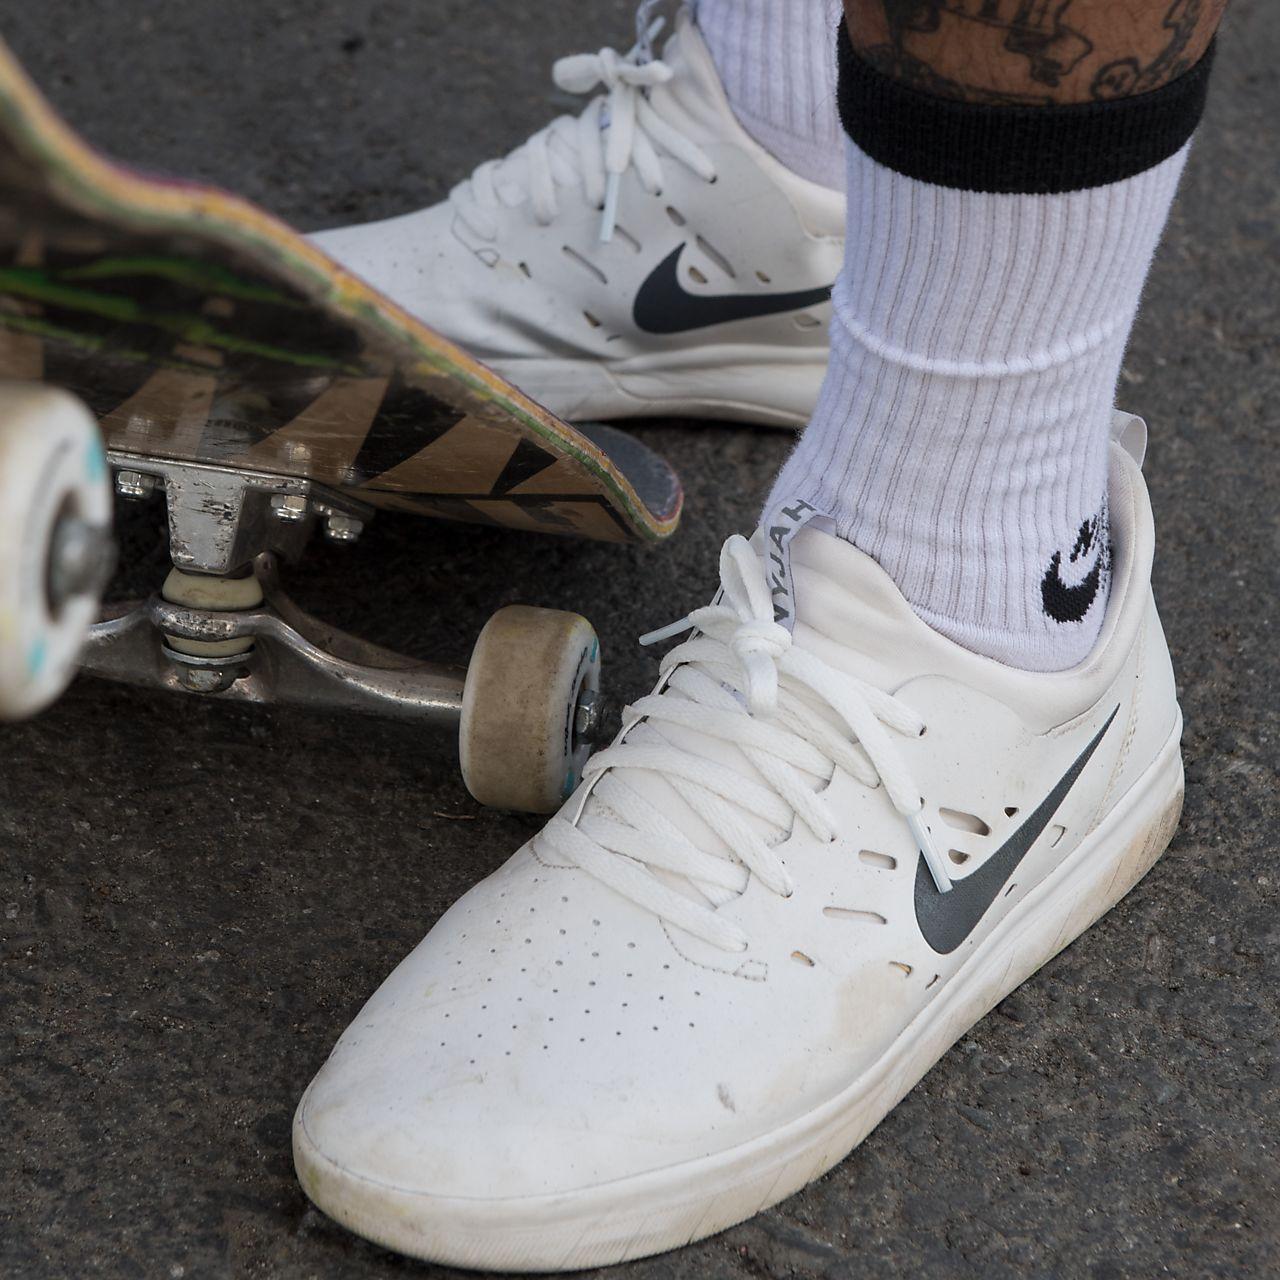 Nike SB Shoe Nyjah Free Jade  Extreme Skates